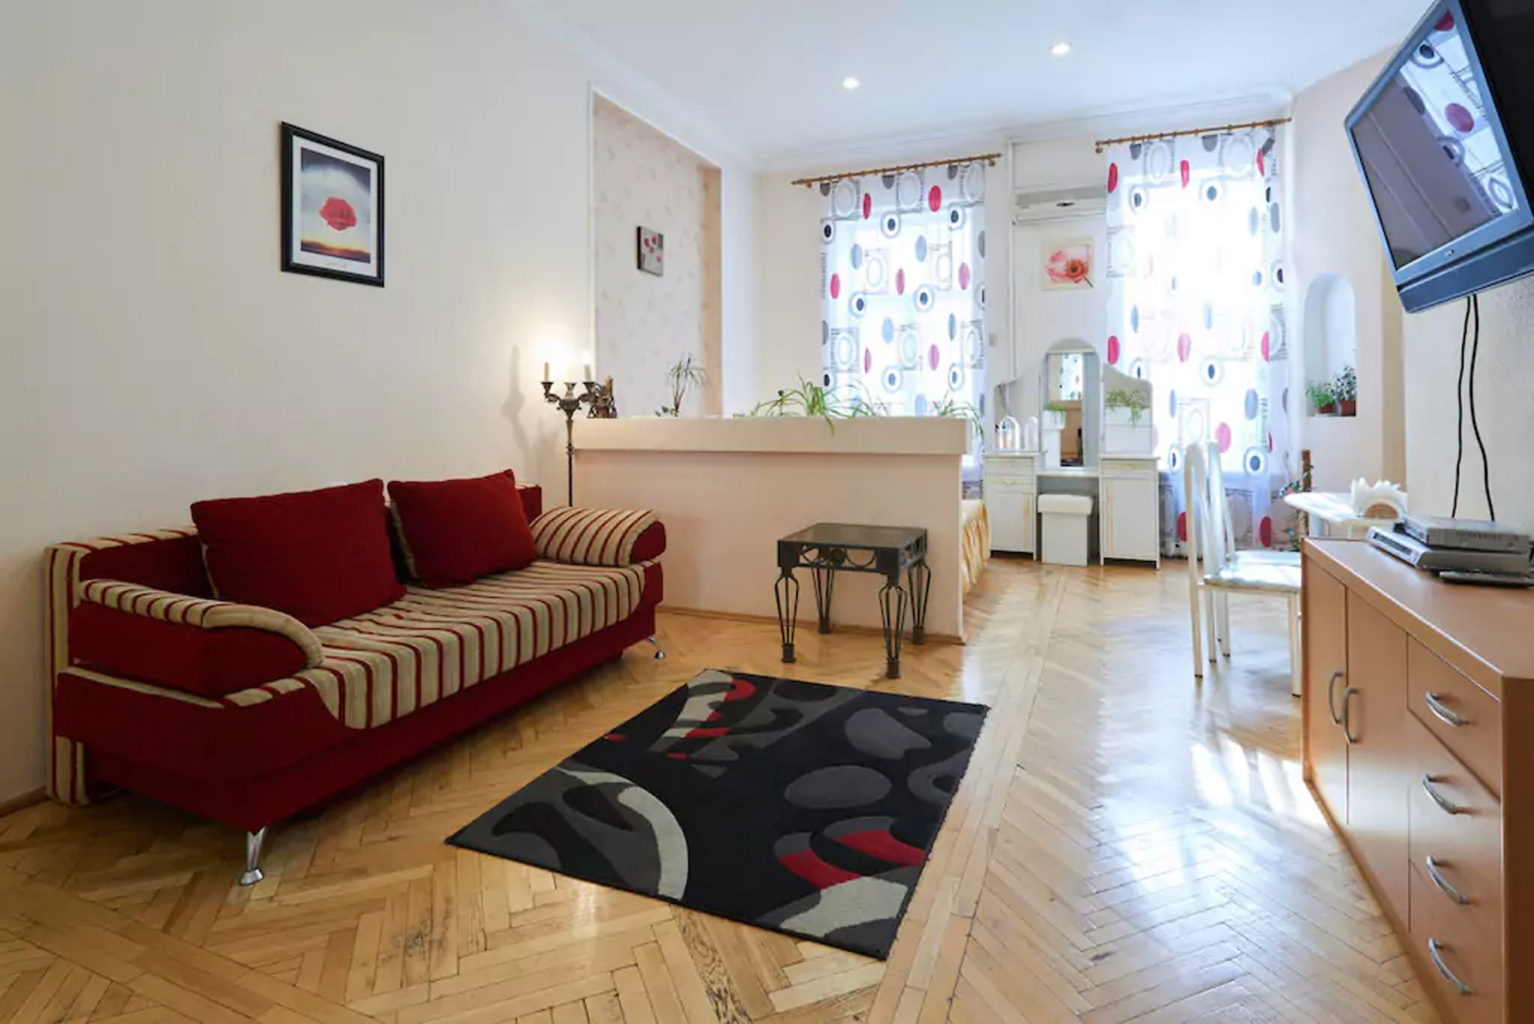 Apartment for rent in Kiev on Maydan Kostelnaya 9